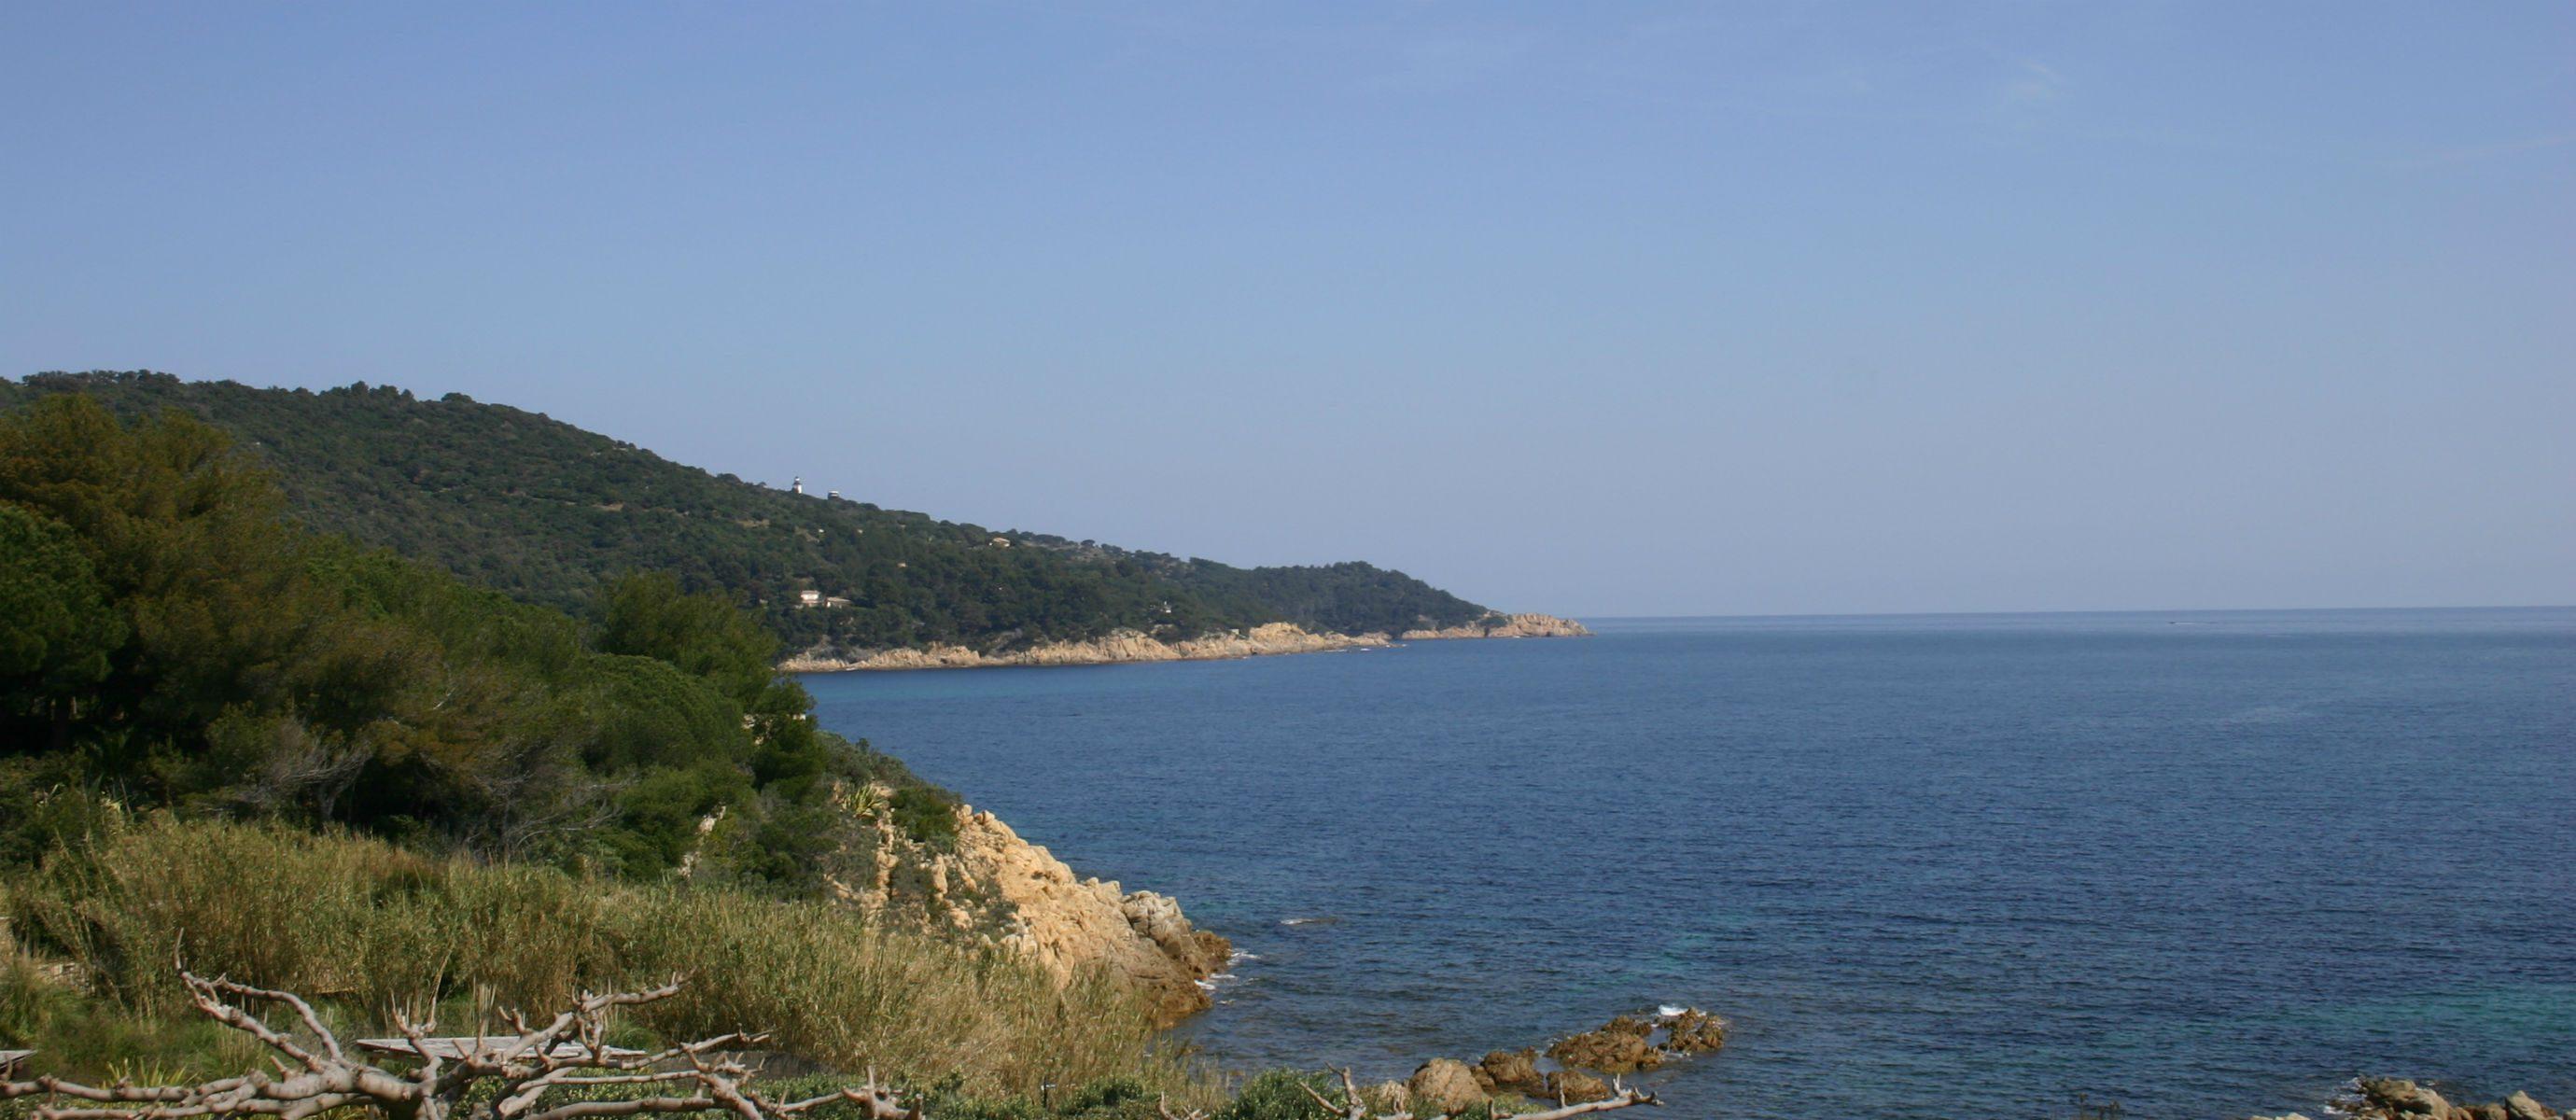 Mediterranean HorizonP19